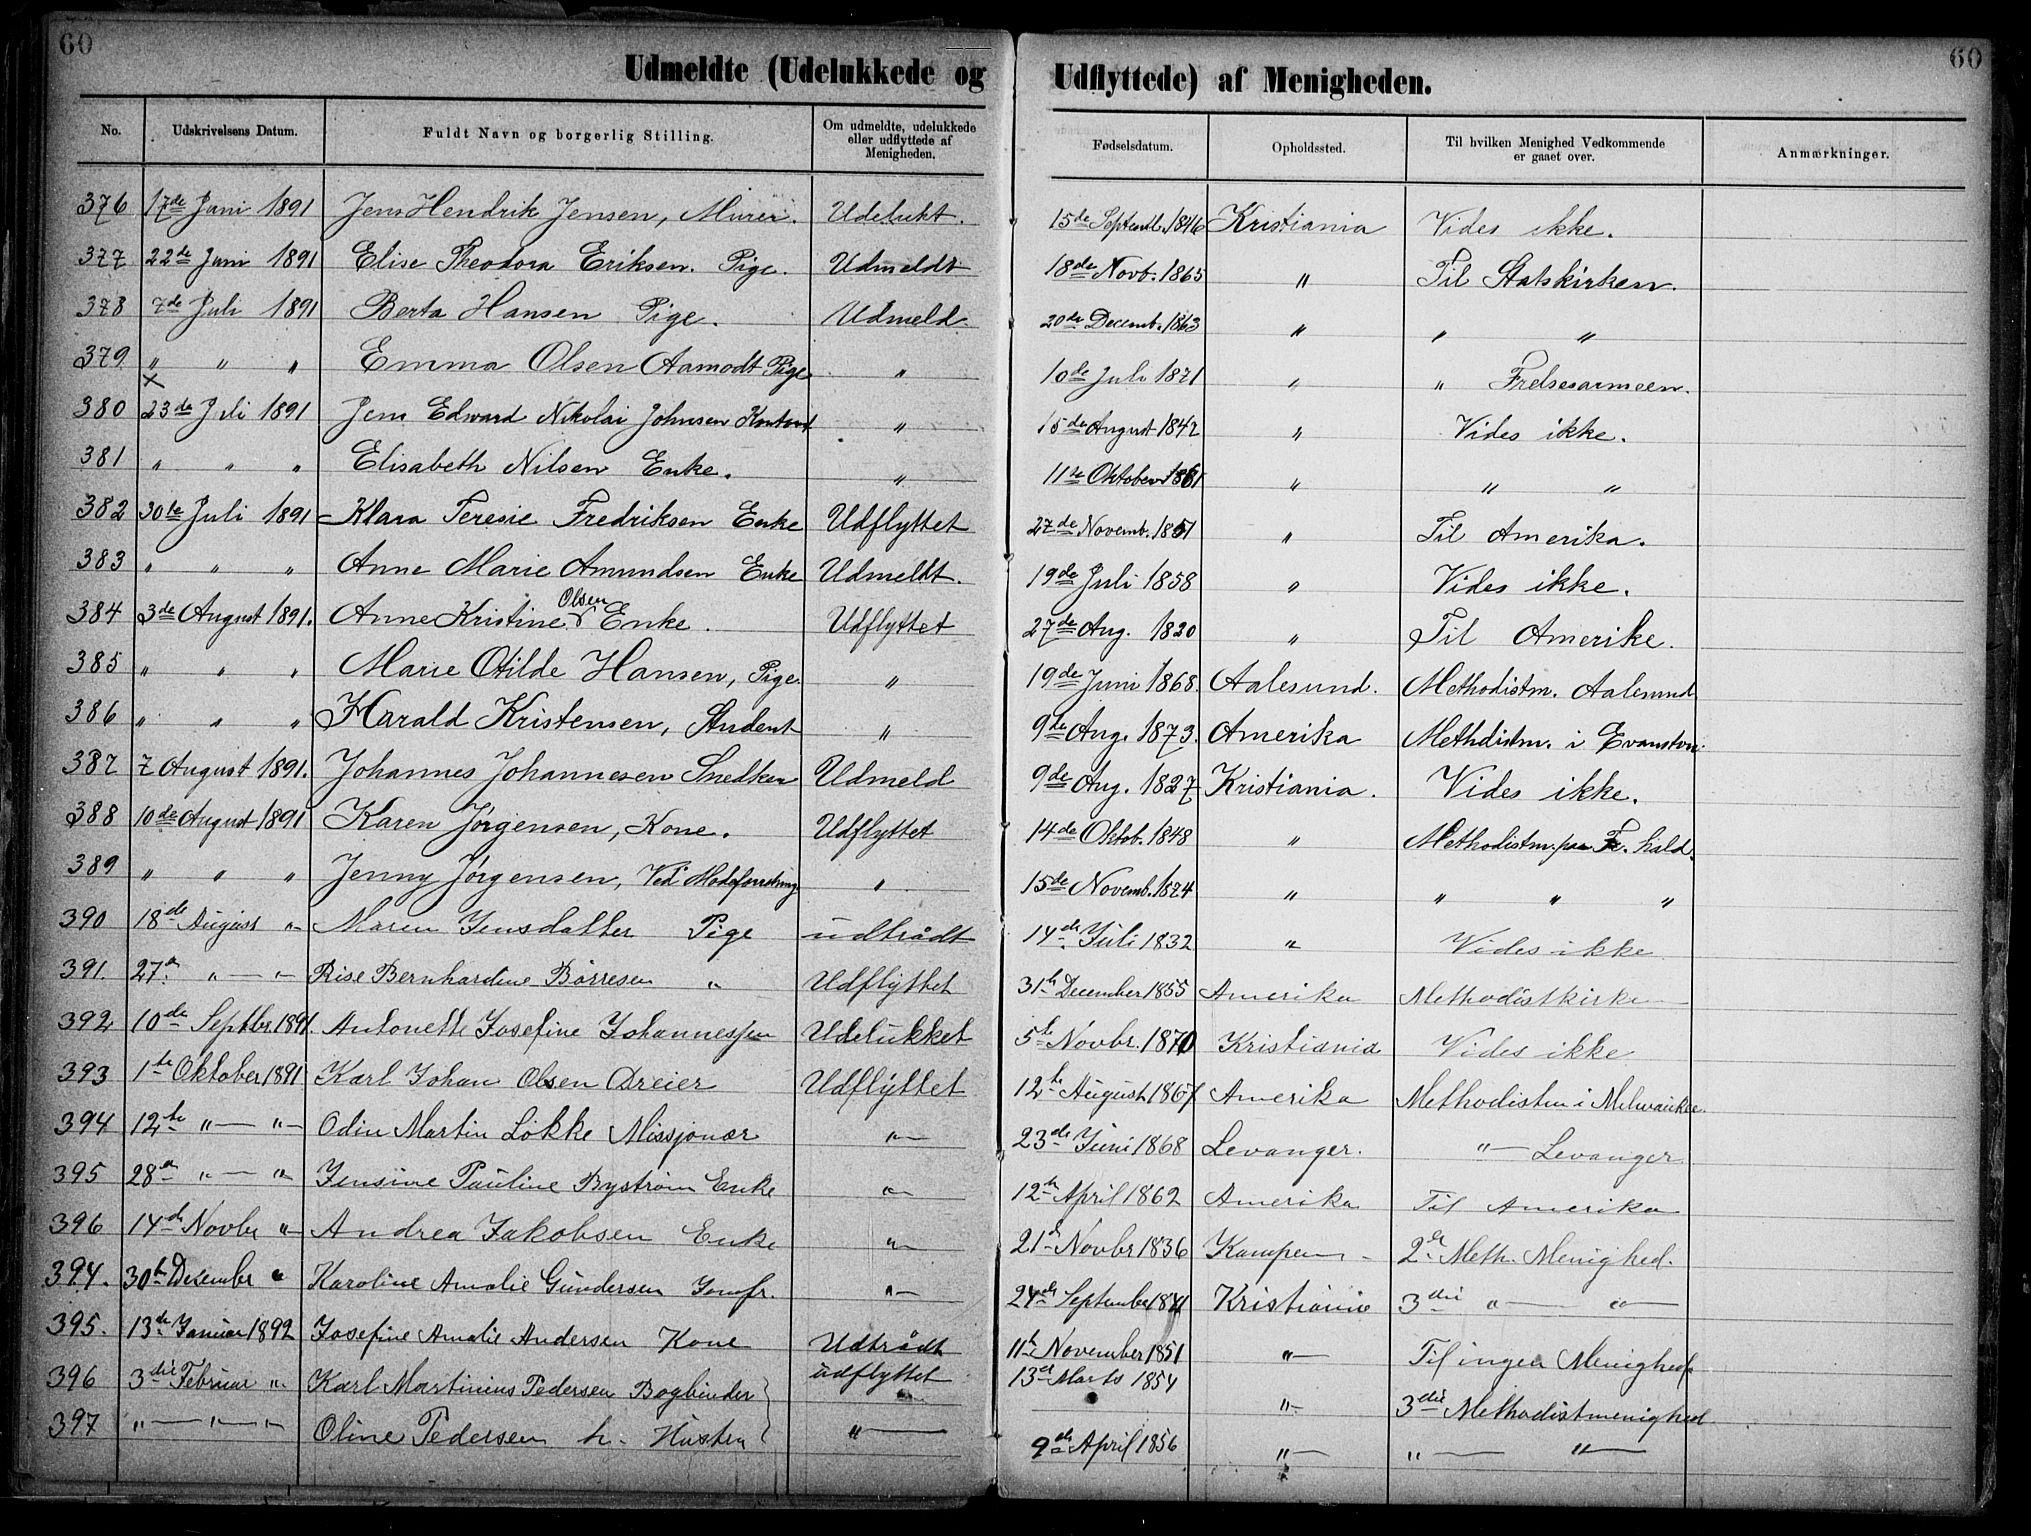 SAO, Første Metodistkirke Oslo -  menighetsprotokoller, F/L0002: Dissenterprotokoll nr. 2, 1883-1892, s. 60